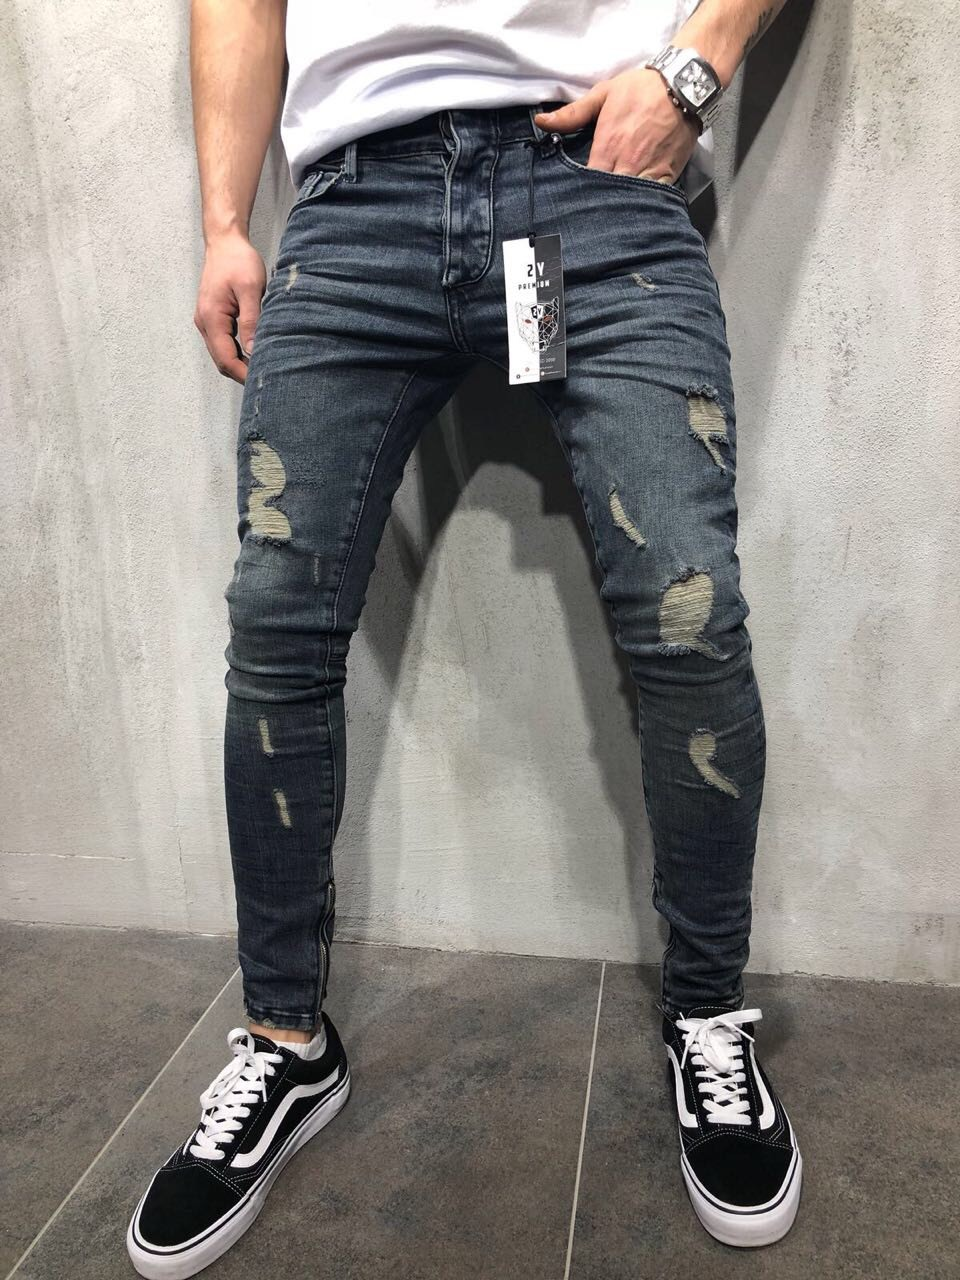 Tight-fitting zipper   jeans   men's slim denim jogging socks stretch men's denim pencil pants blue men's   jeans   fashion casual